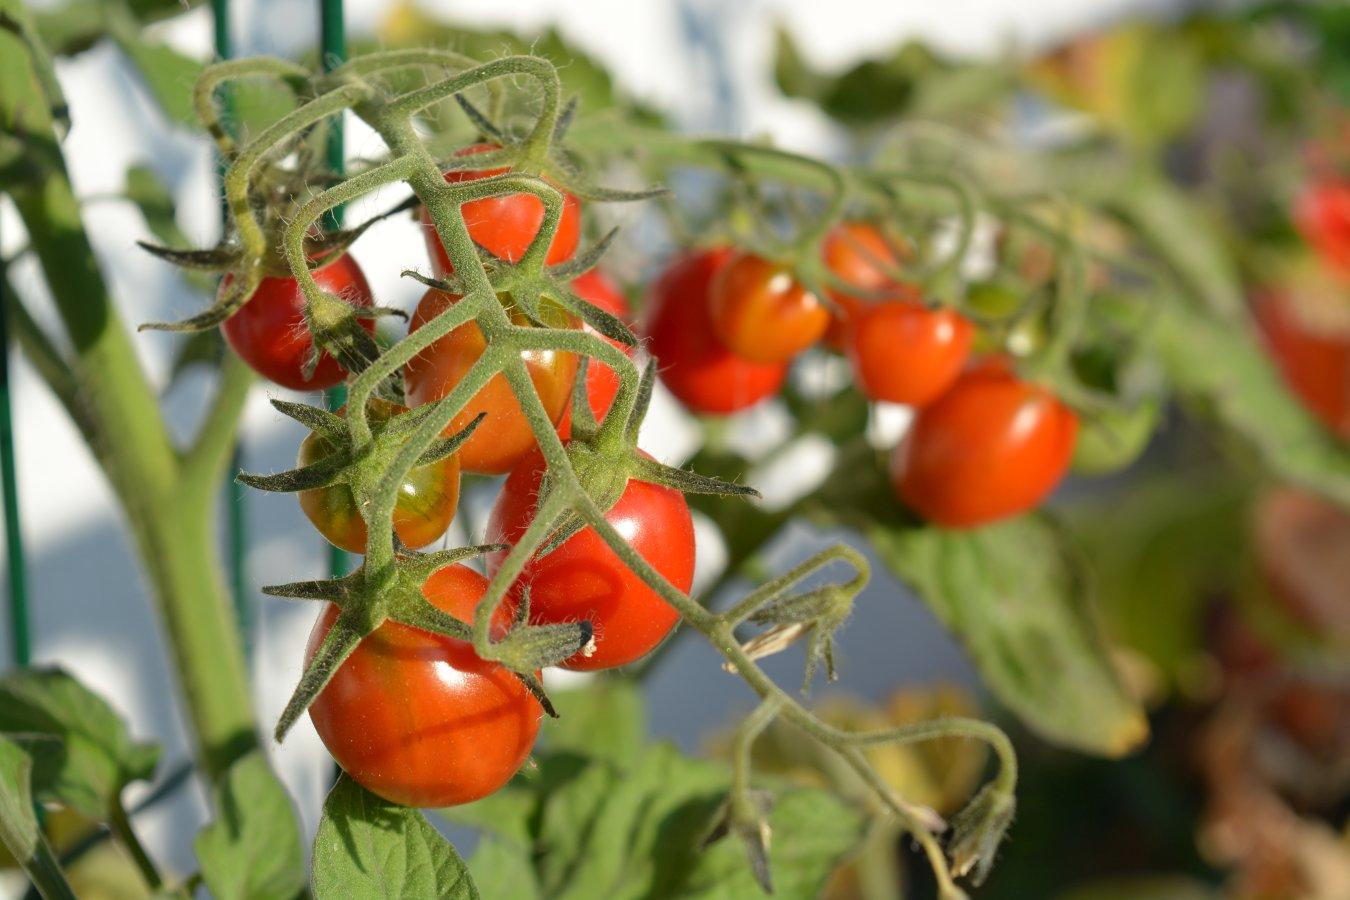 [Jede Menge Tomaten]